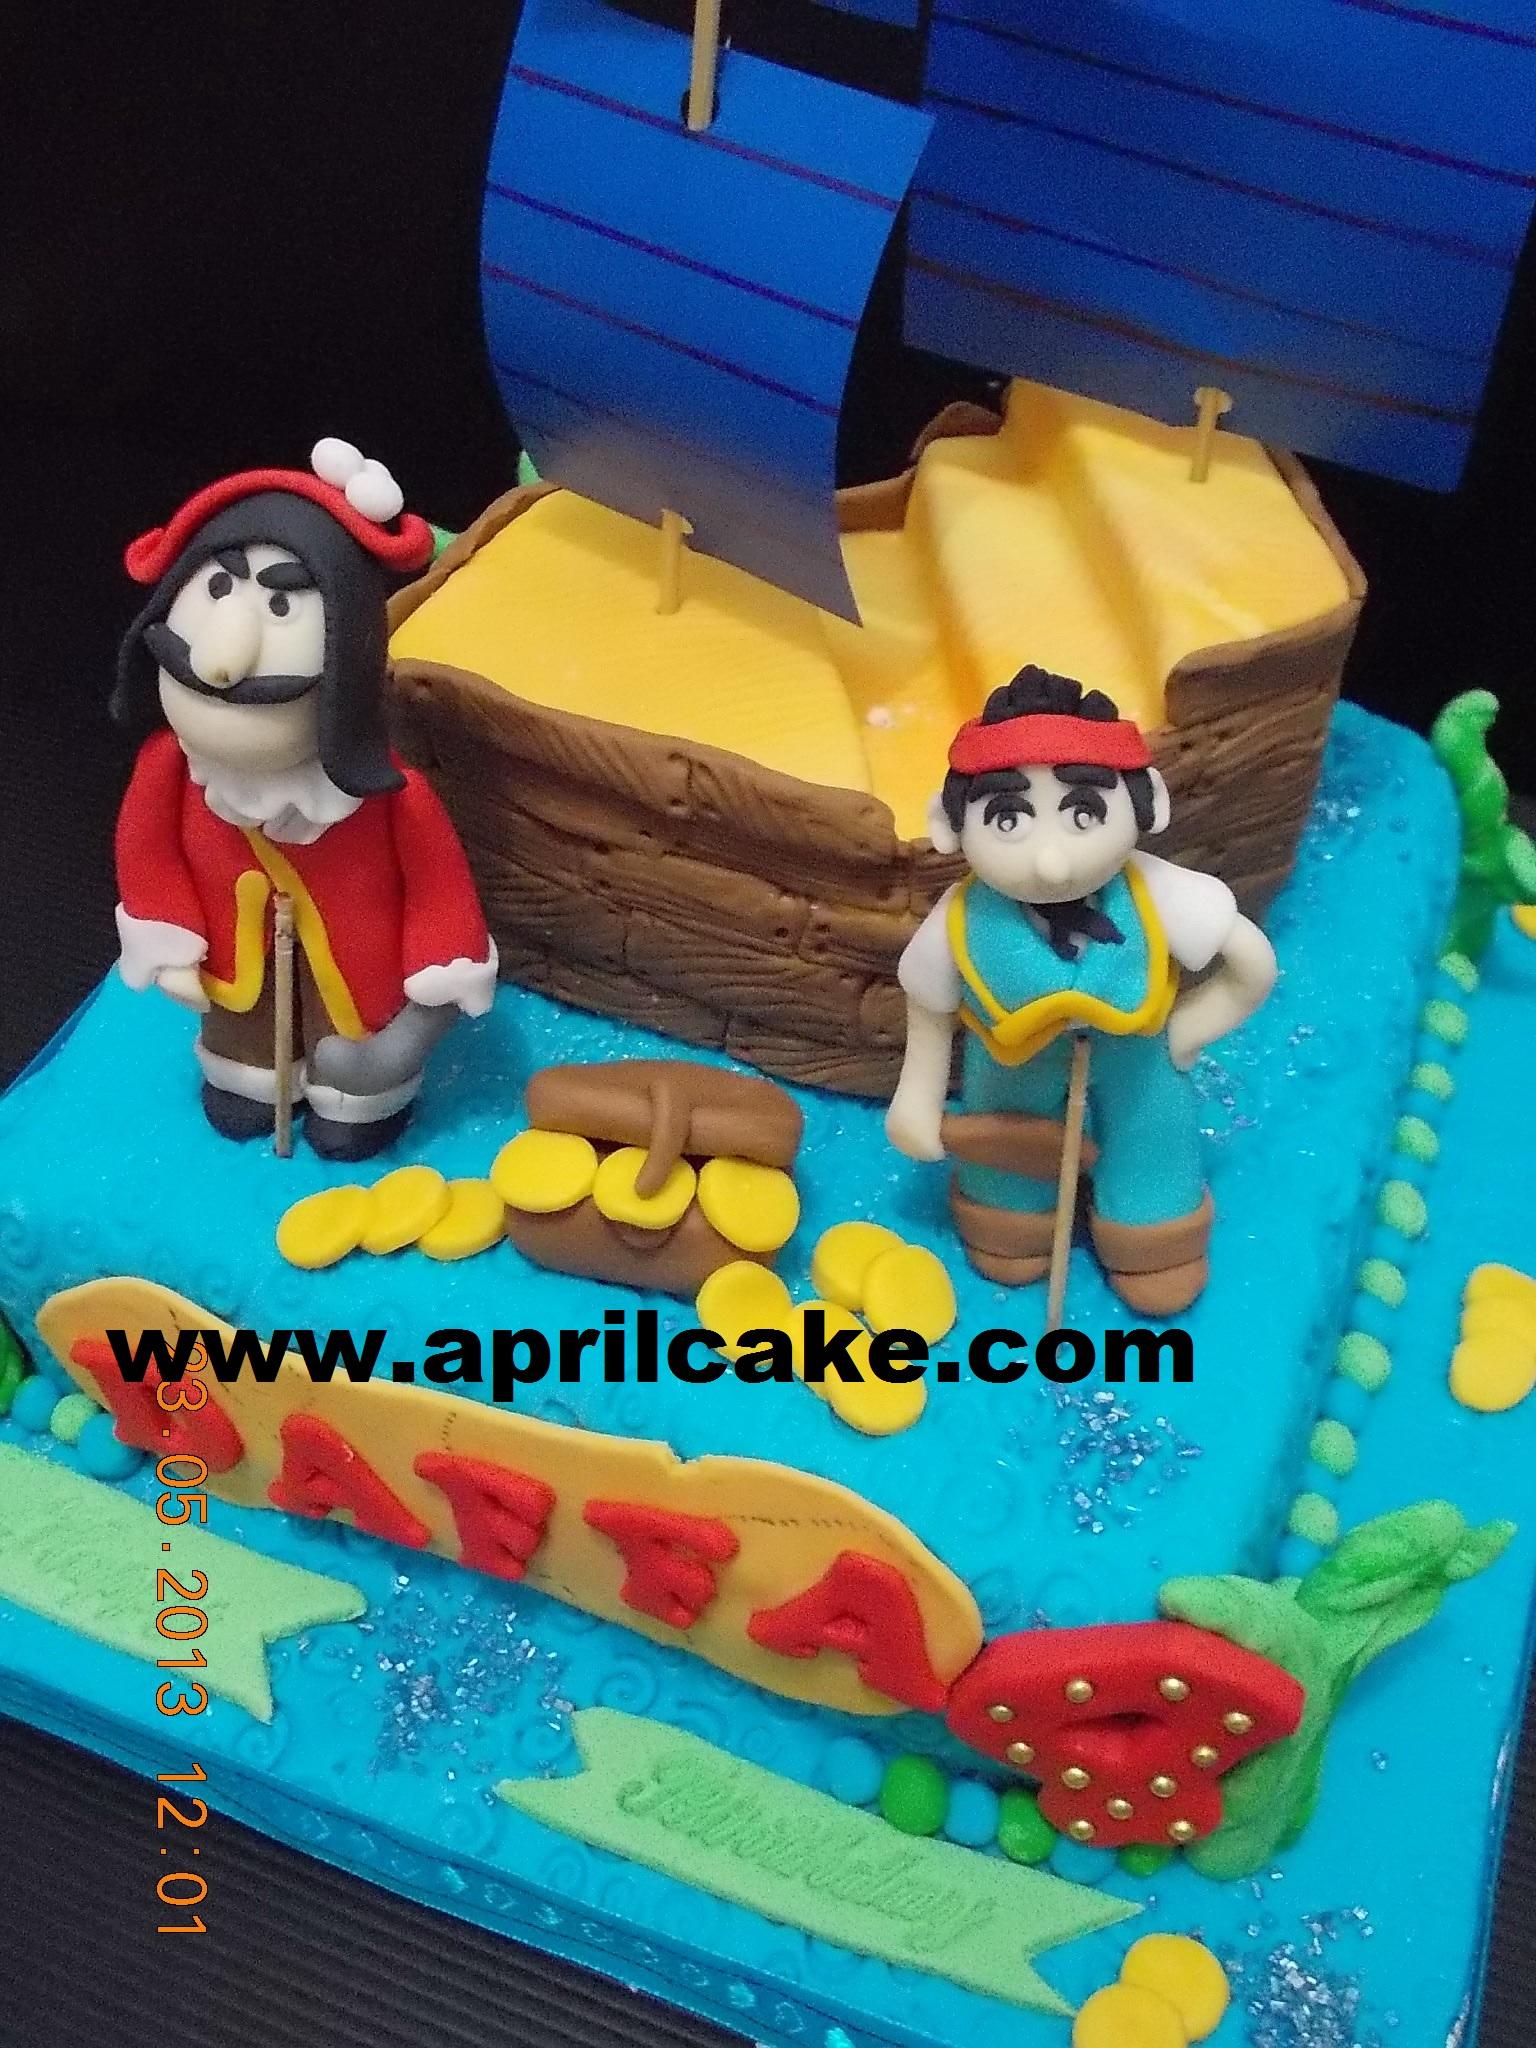 Jake and Neverland cake Daffa